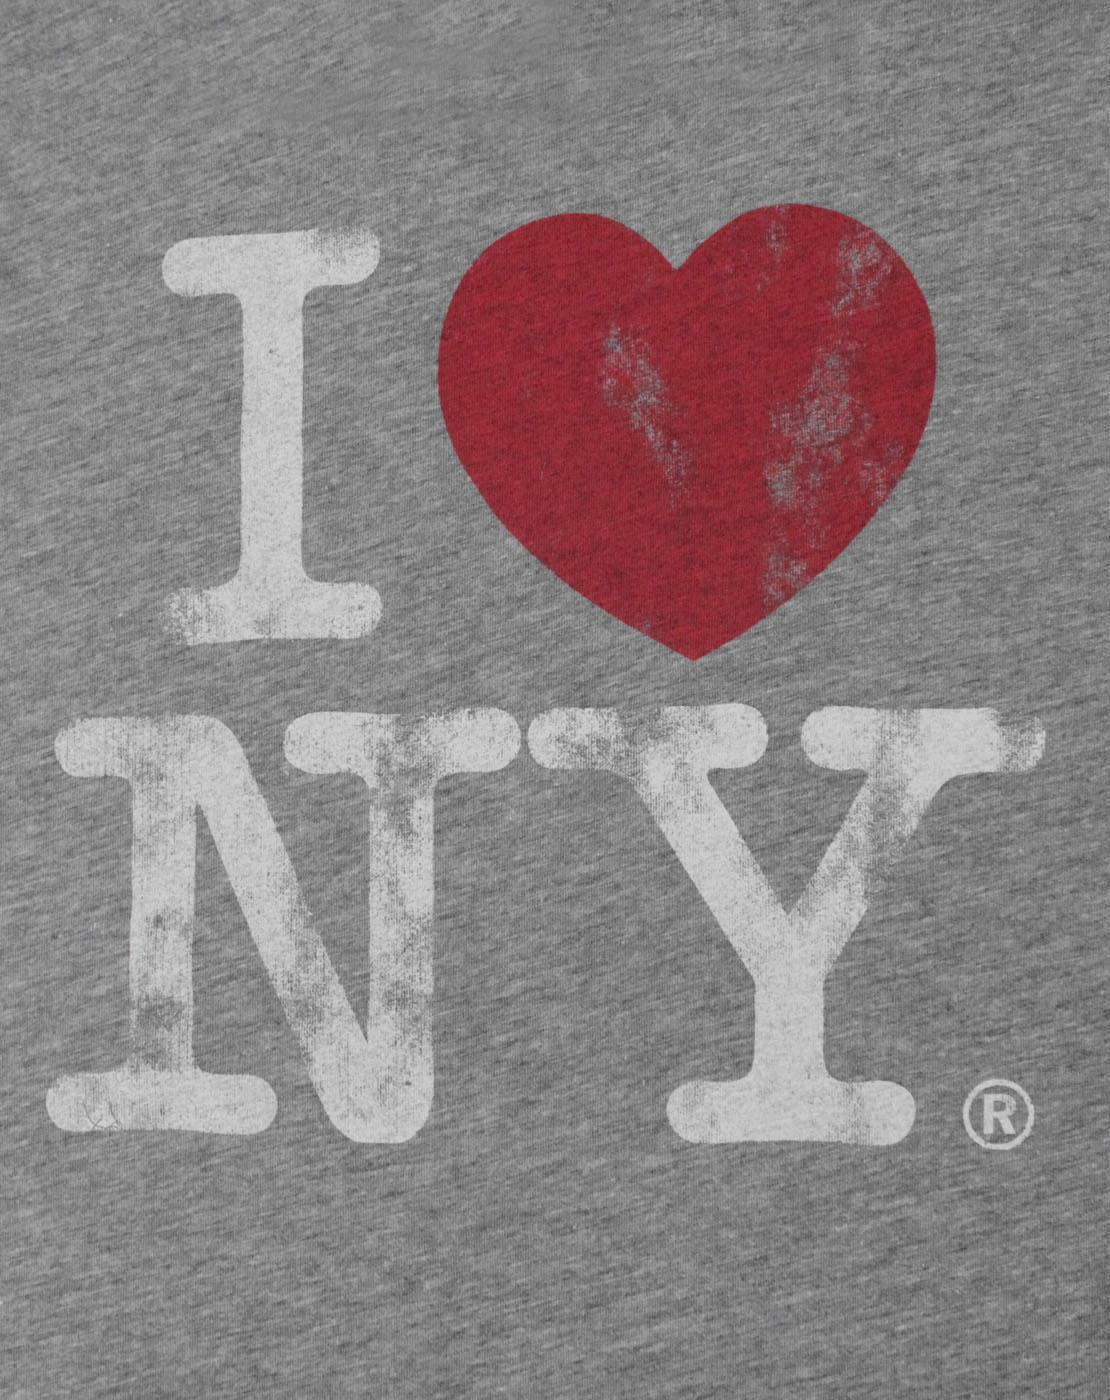 Junk-Food-I-Love-New-York-Women-039-s-T-Shirt thumbnail 6